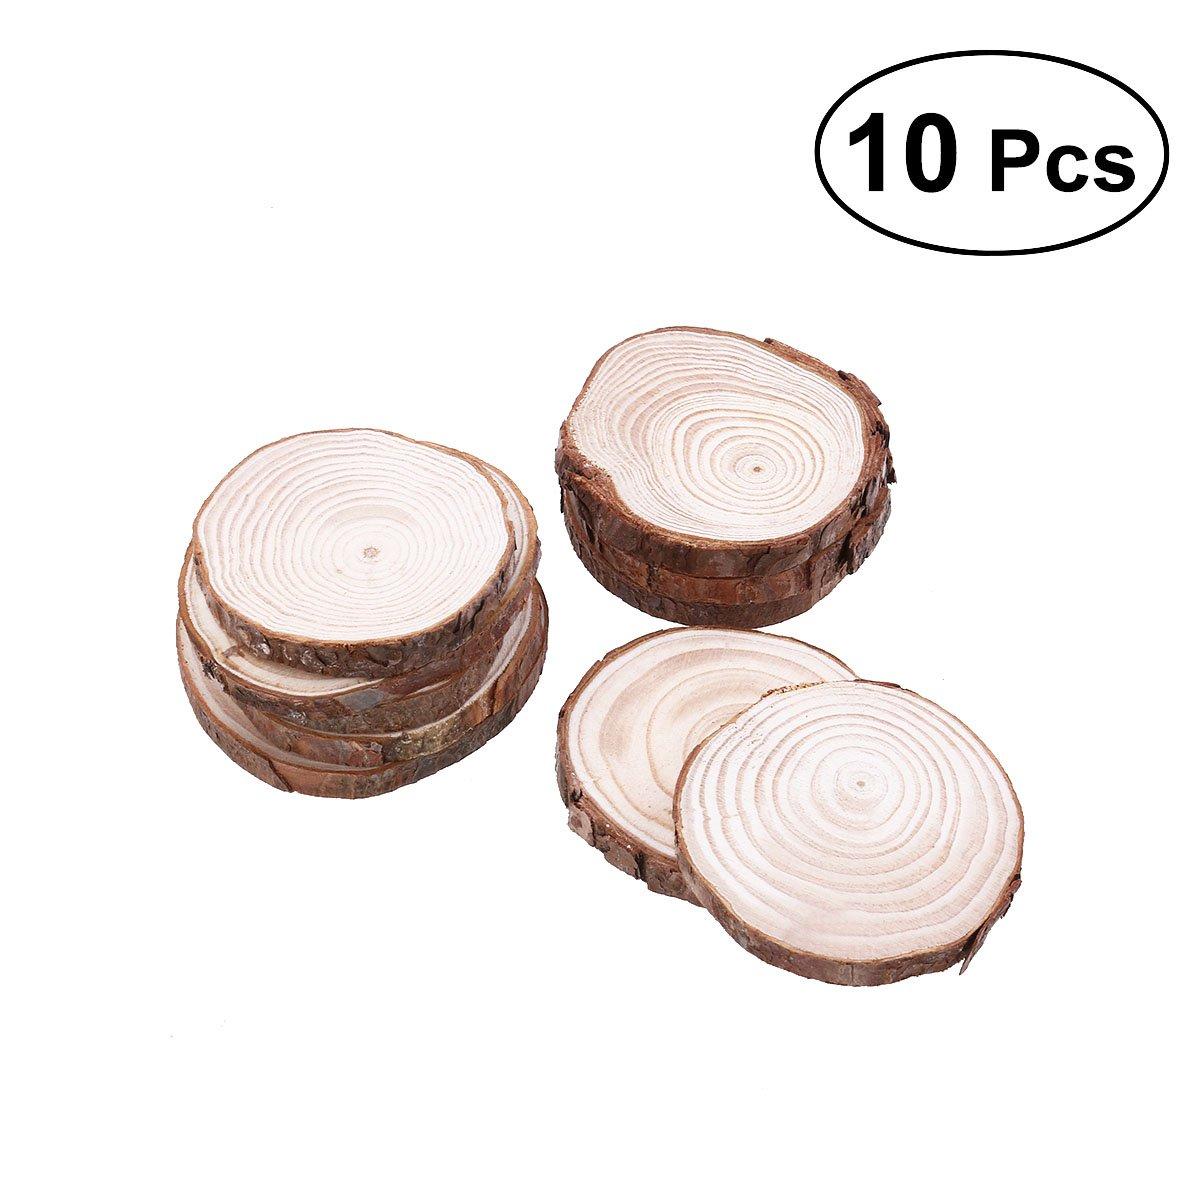 ROSENICE 8-9CM Wood Log 10pcs Slices Discs for DIY Crafts Wedding Centerpieces 4336909798